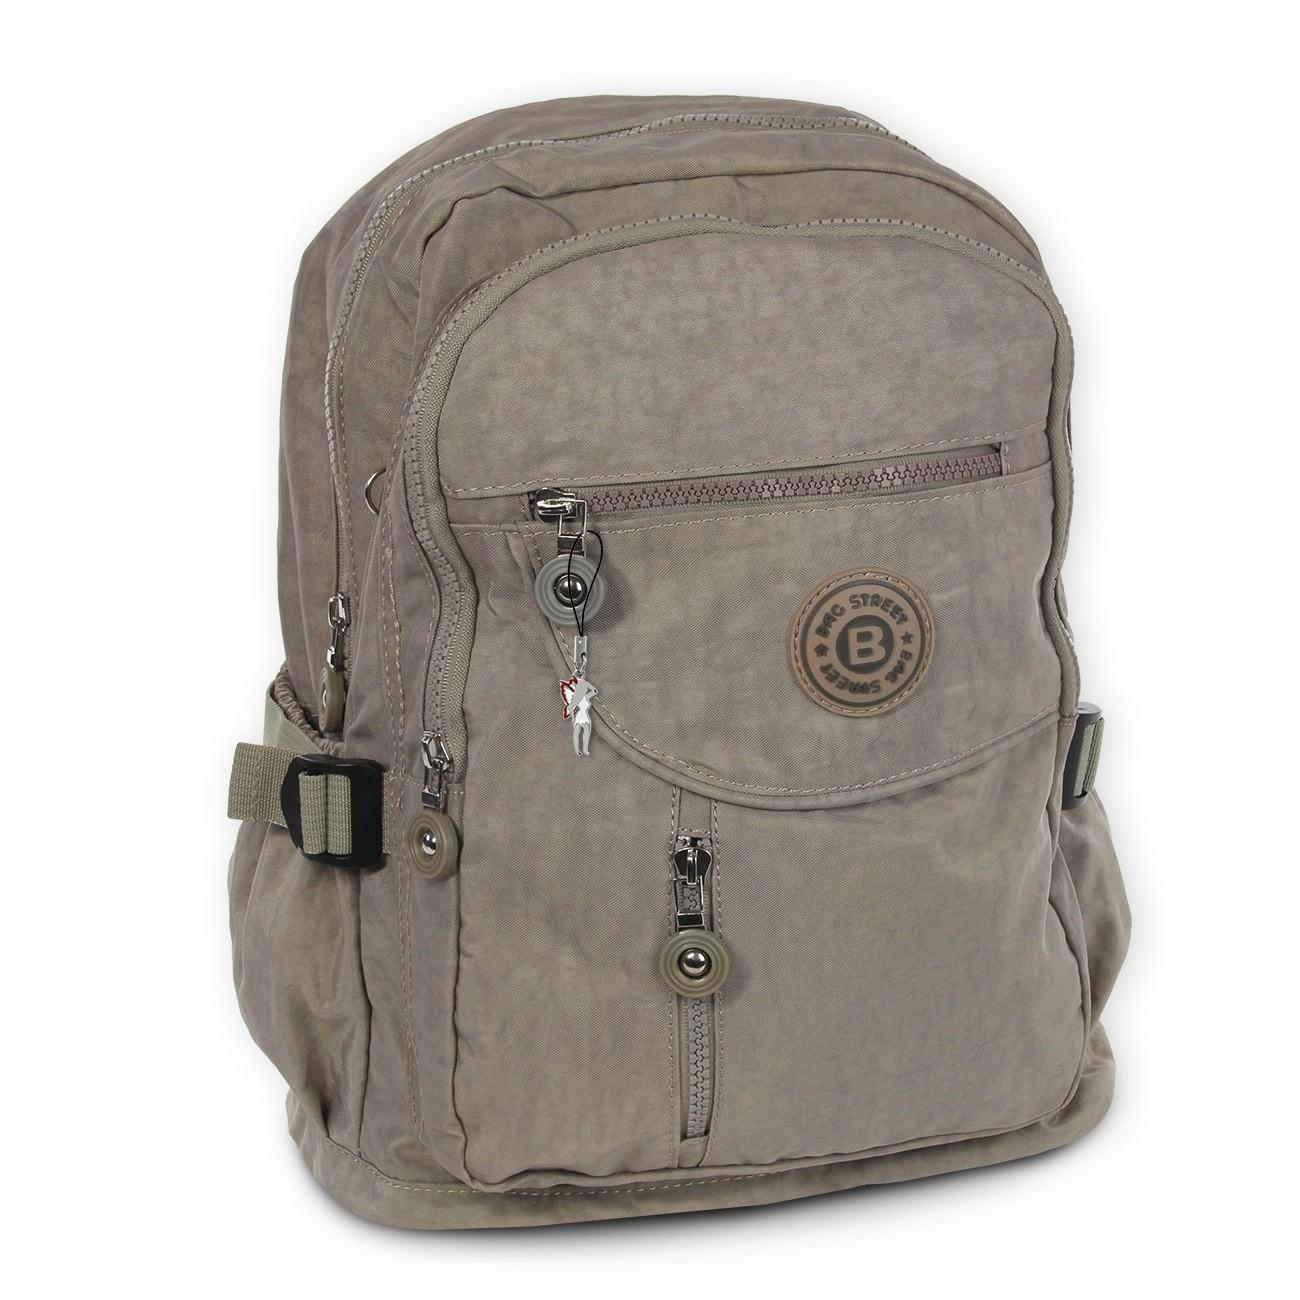 Rucksack, Handtasche Nylon stone, braun Damen Cityrucksack Bag Street OTJ604L